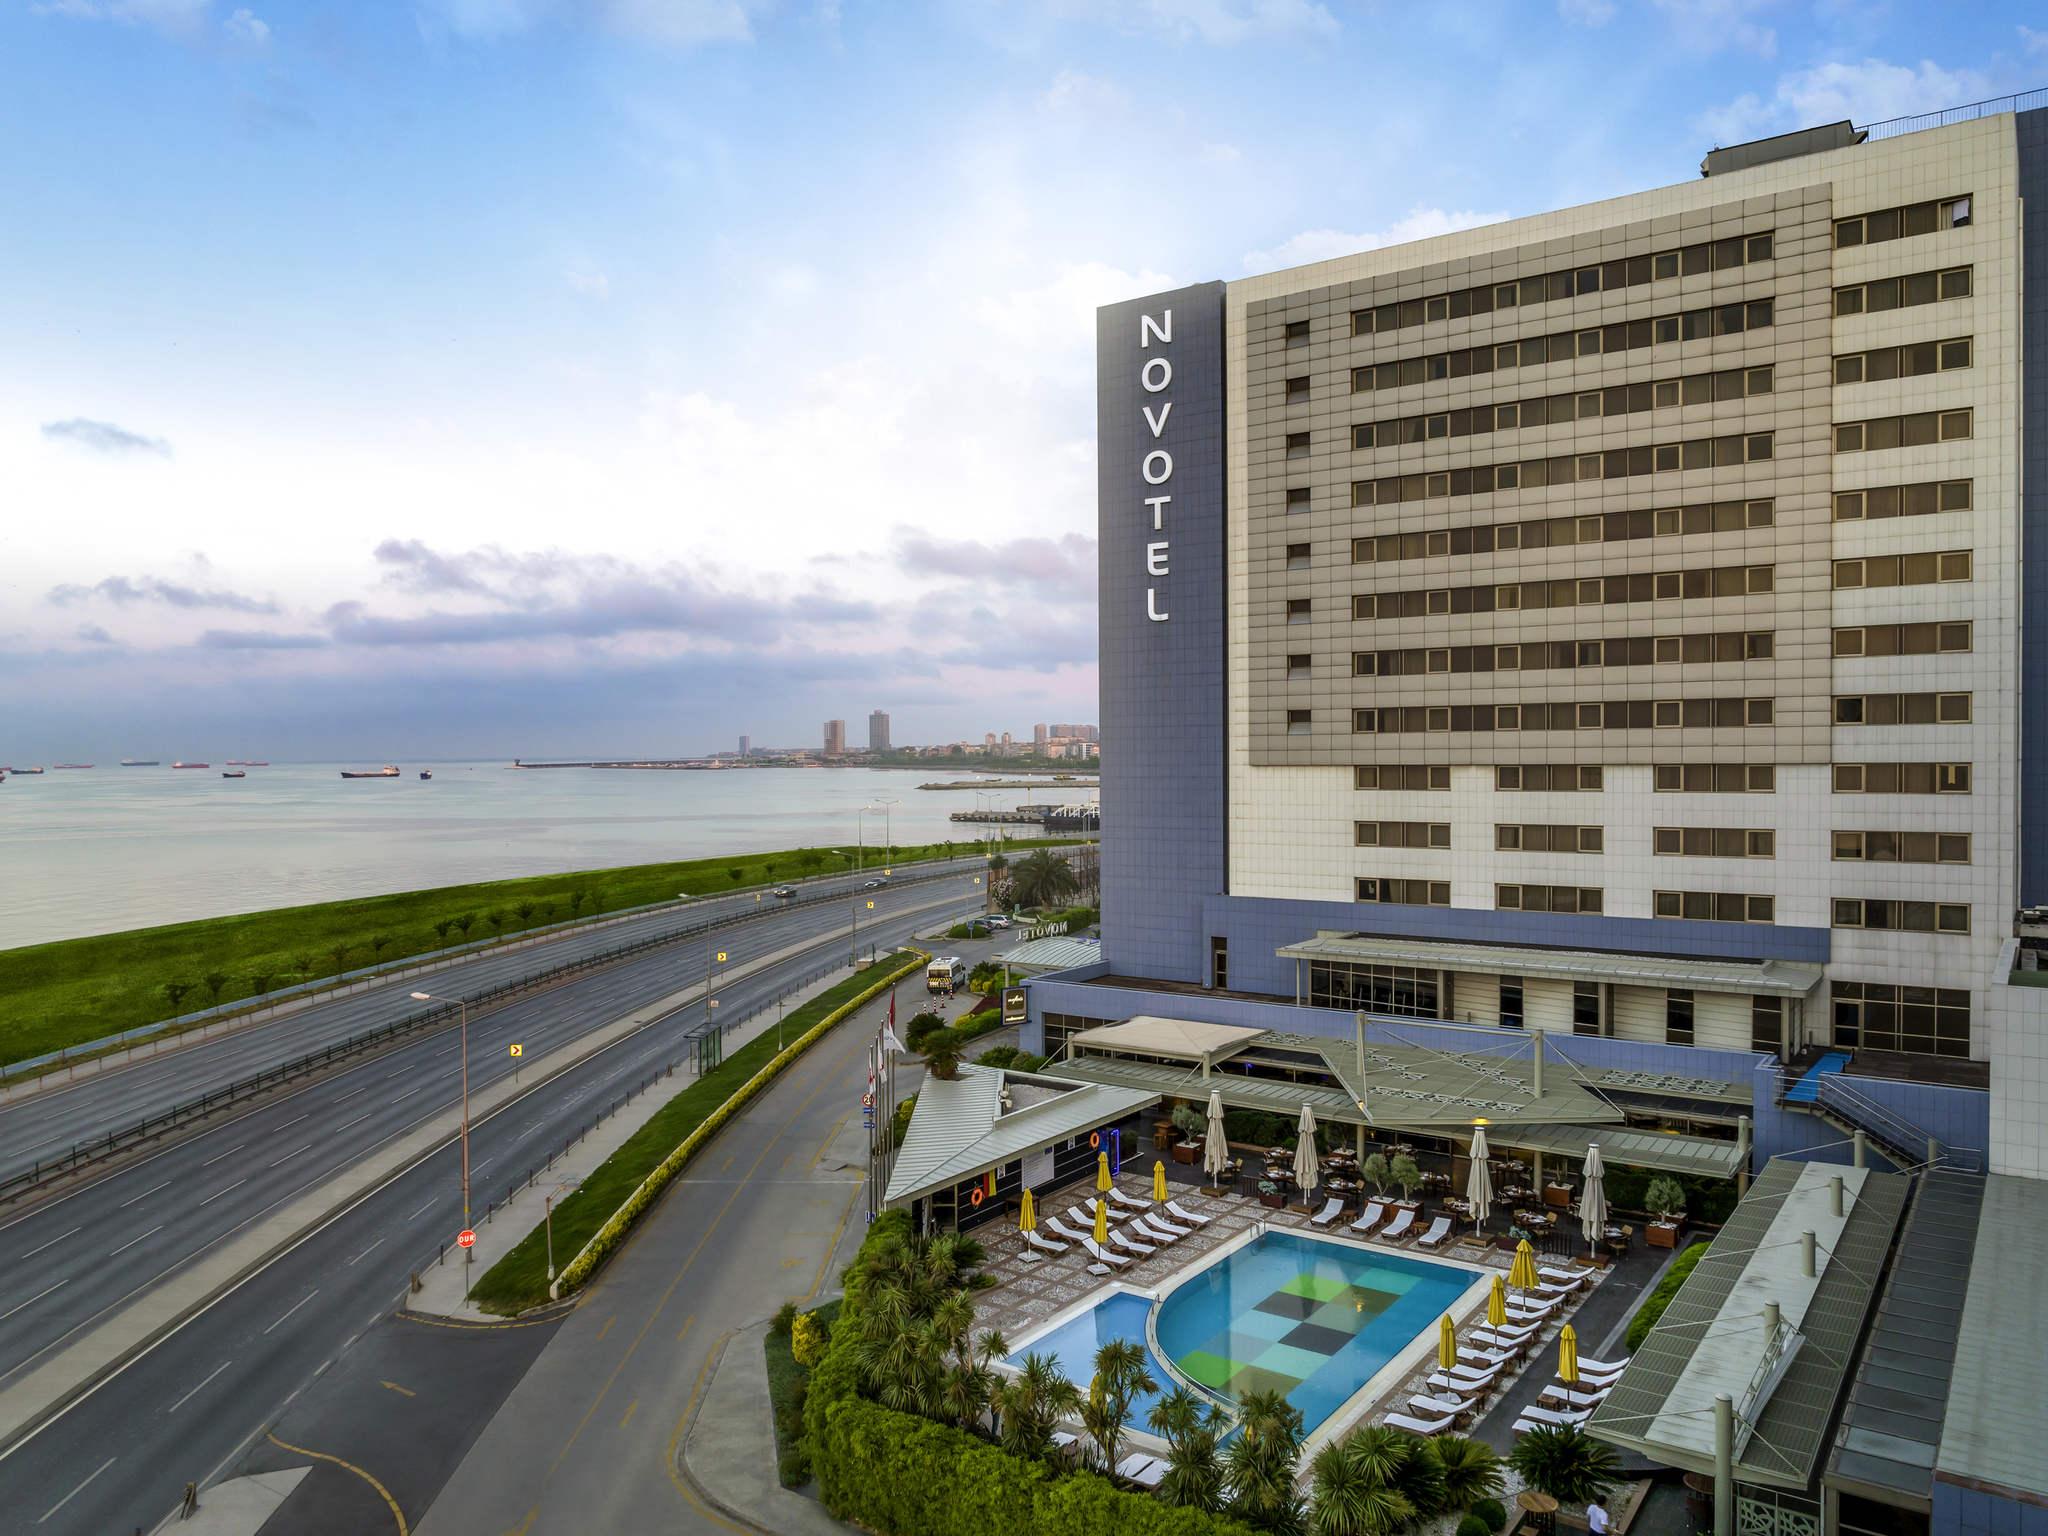 فندق - فندق نوفوتيل Novotel إسطنبول زيتينبورنو